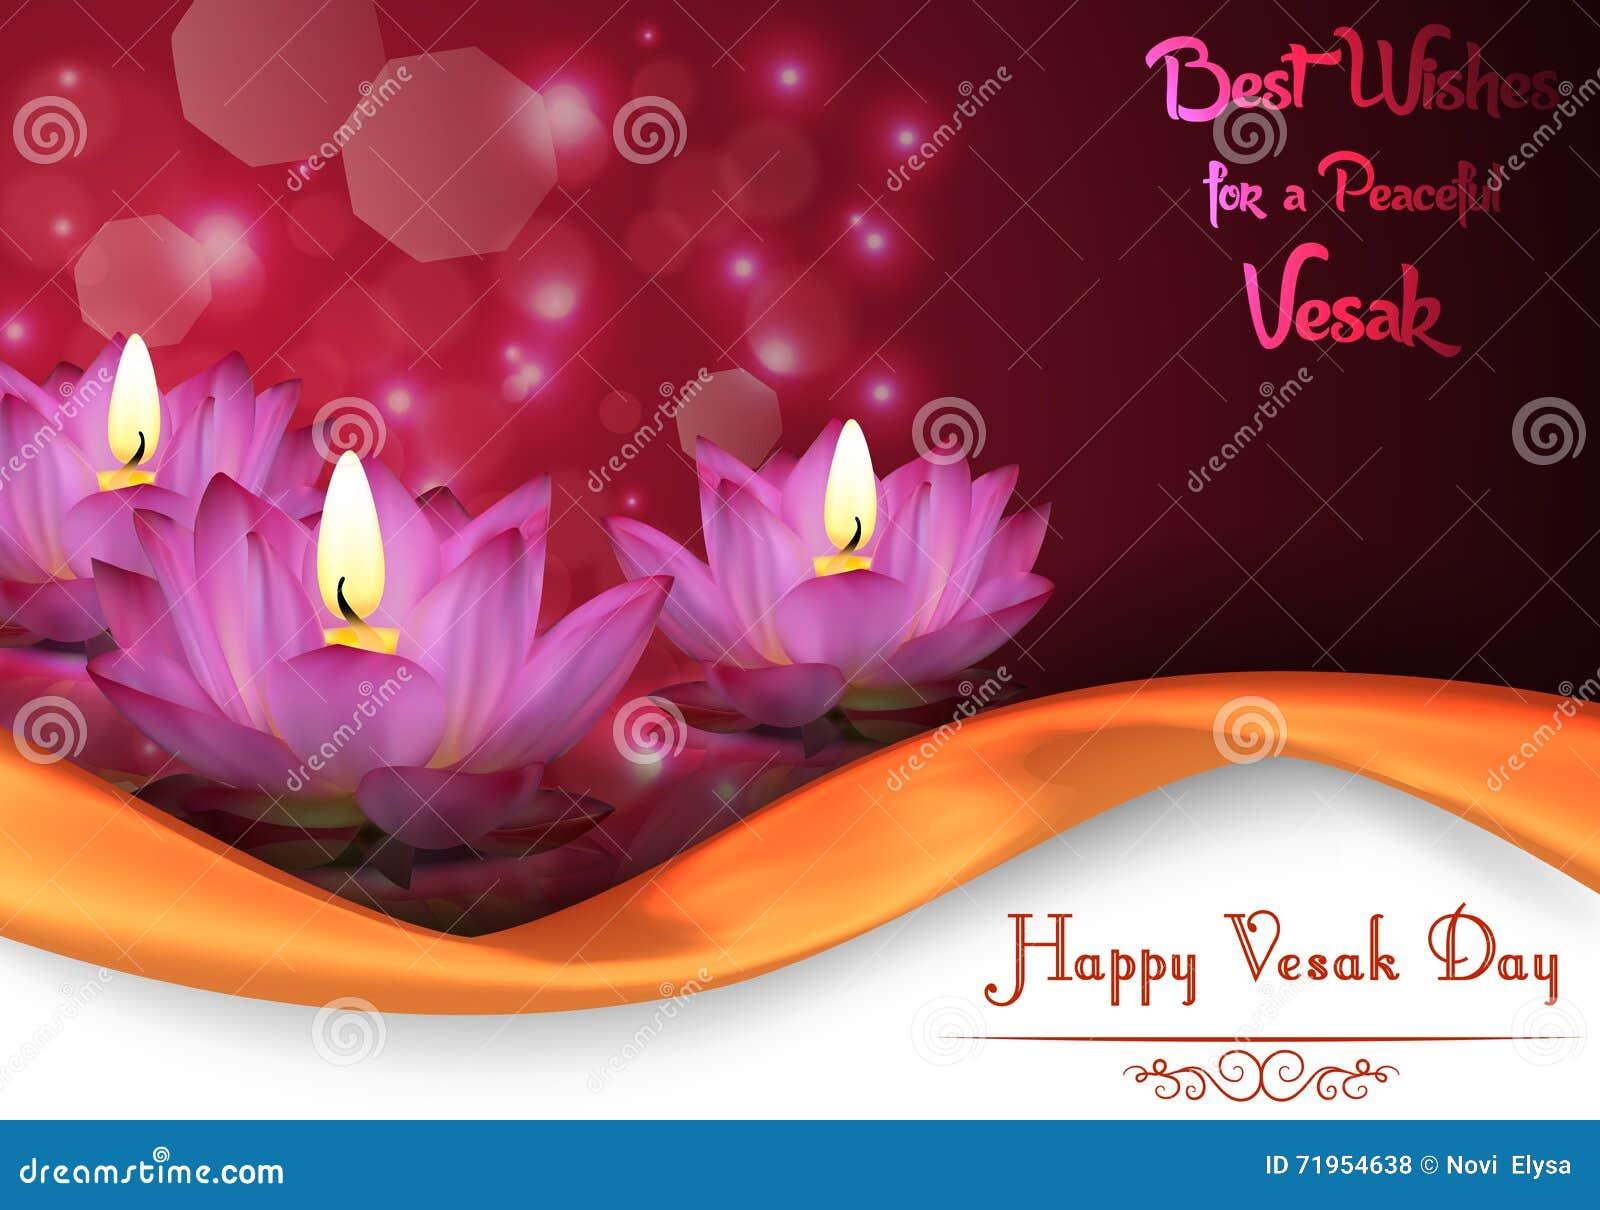 Vesak Day Background Banner Stock Vector Illustration Of Lord